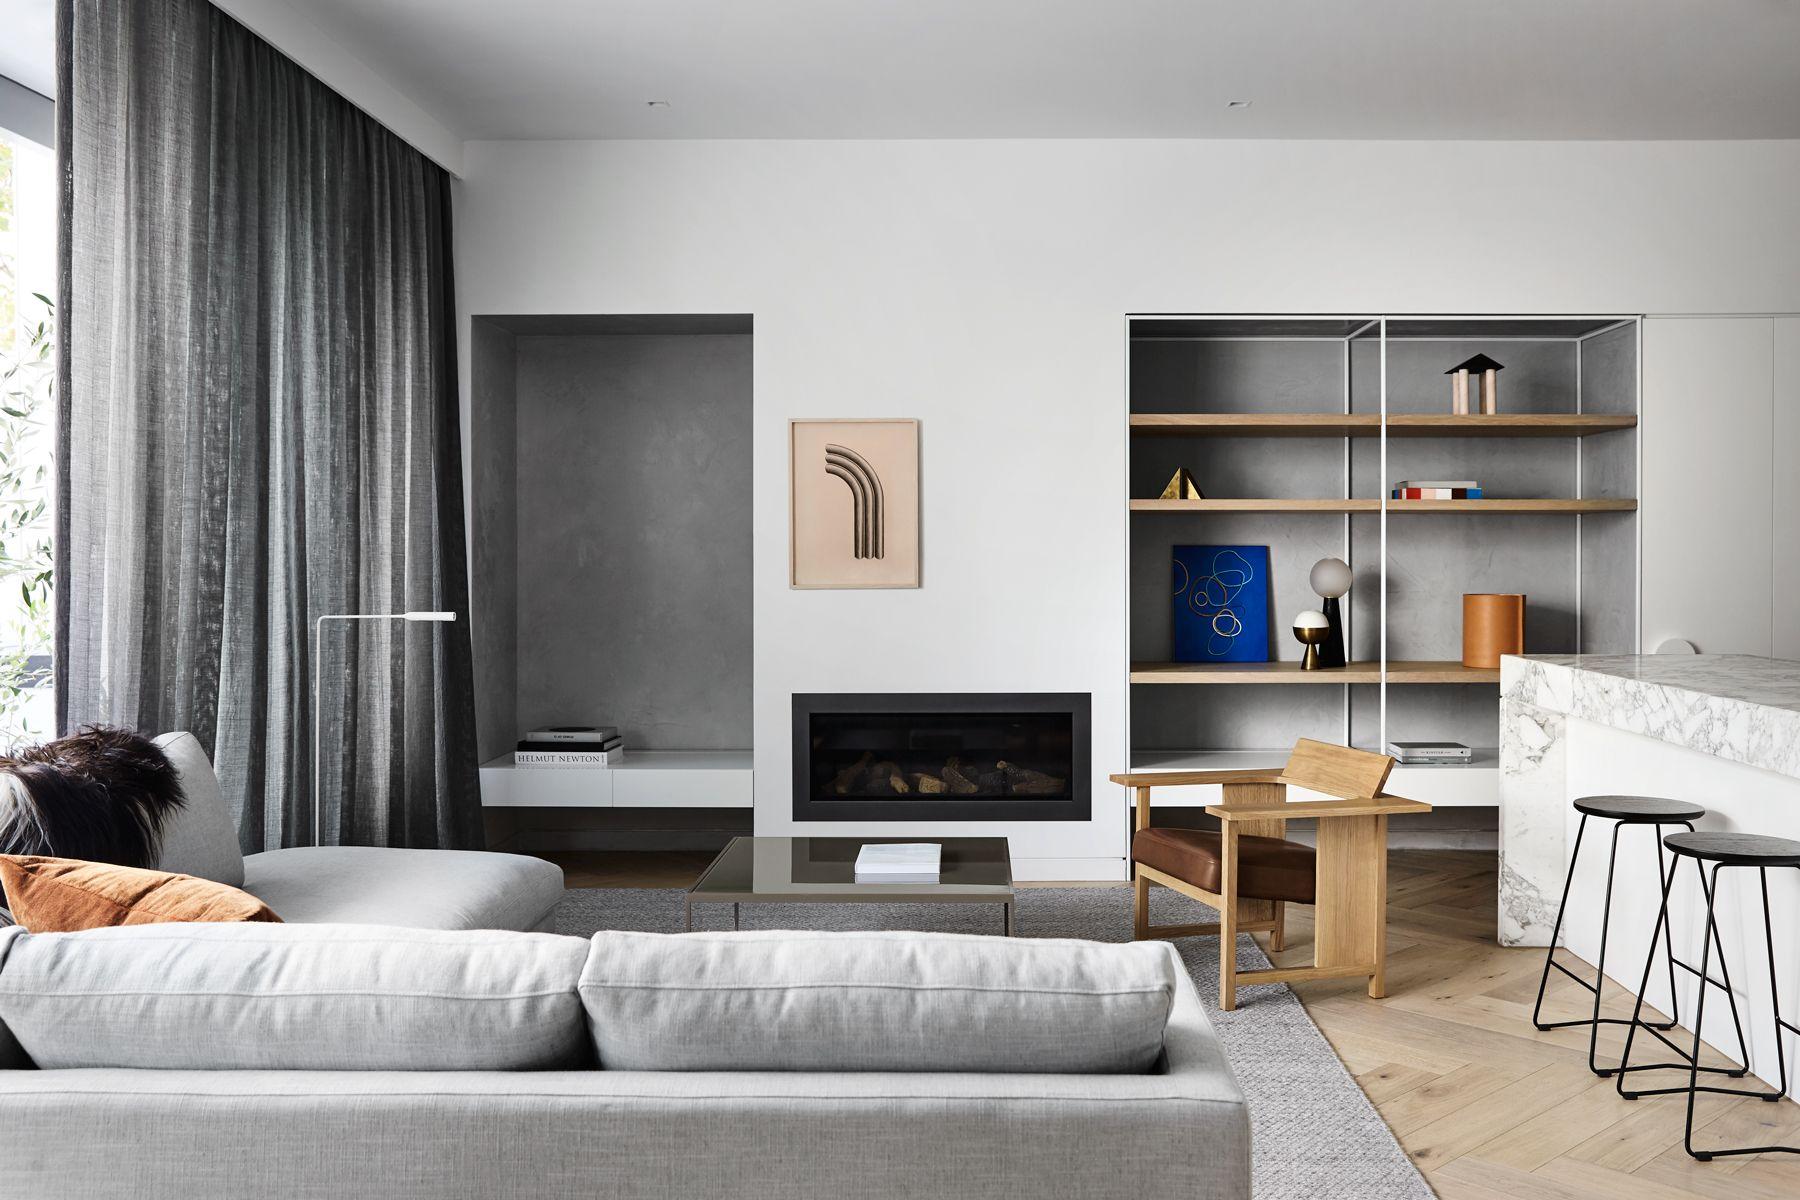 South Yarra Residence Is A Minimalist Interior Design Project Located In Melbourne Australia Minimalist Home Decor Eclectic Bedroom Minimalist Interior Design